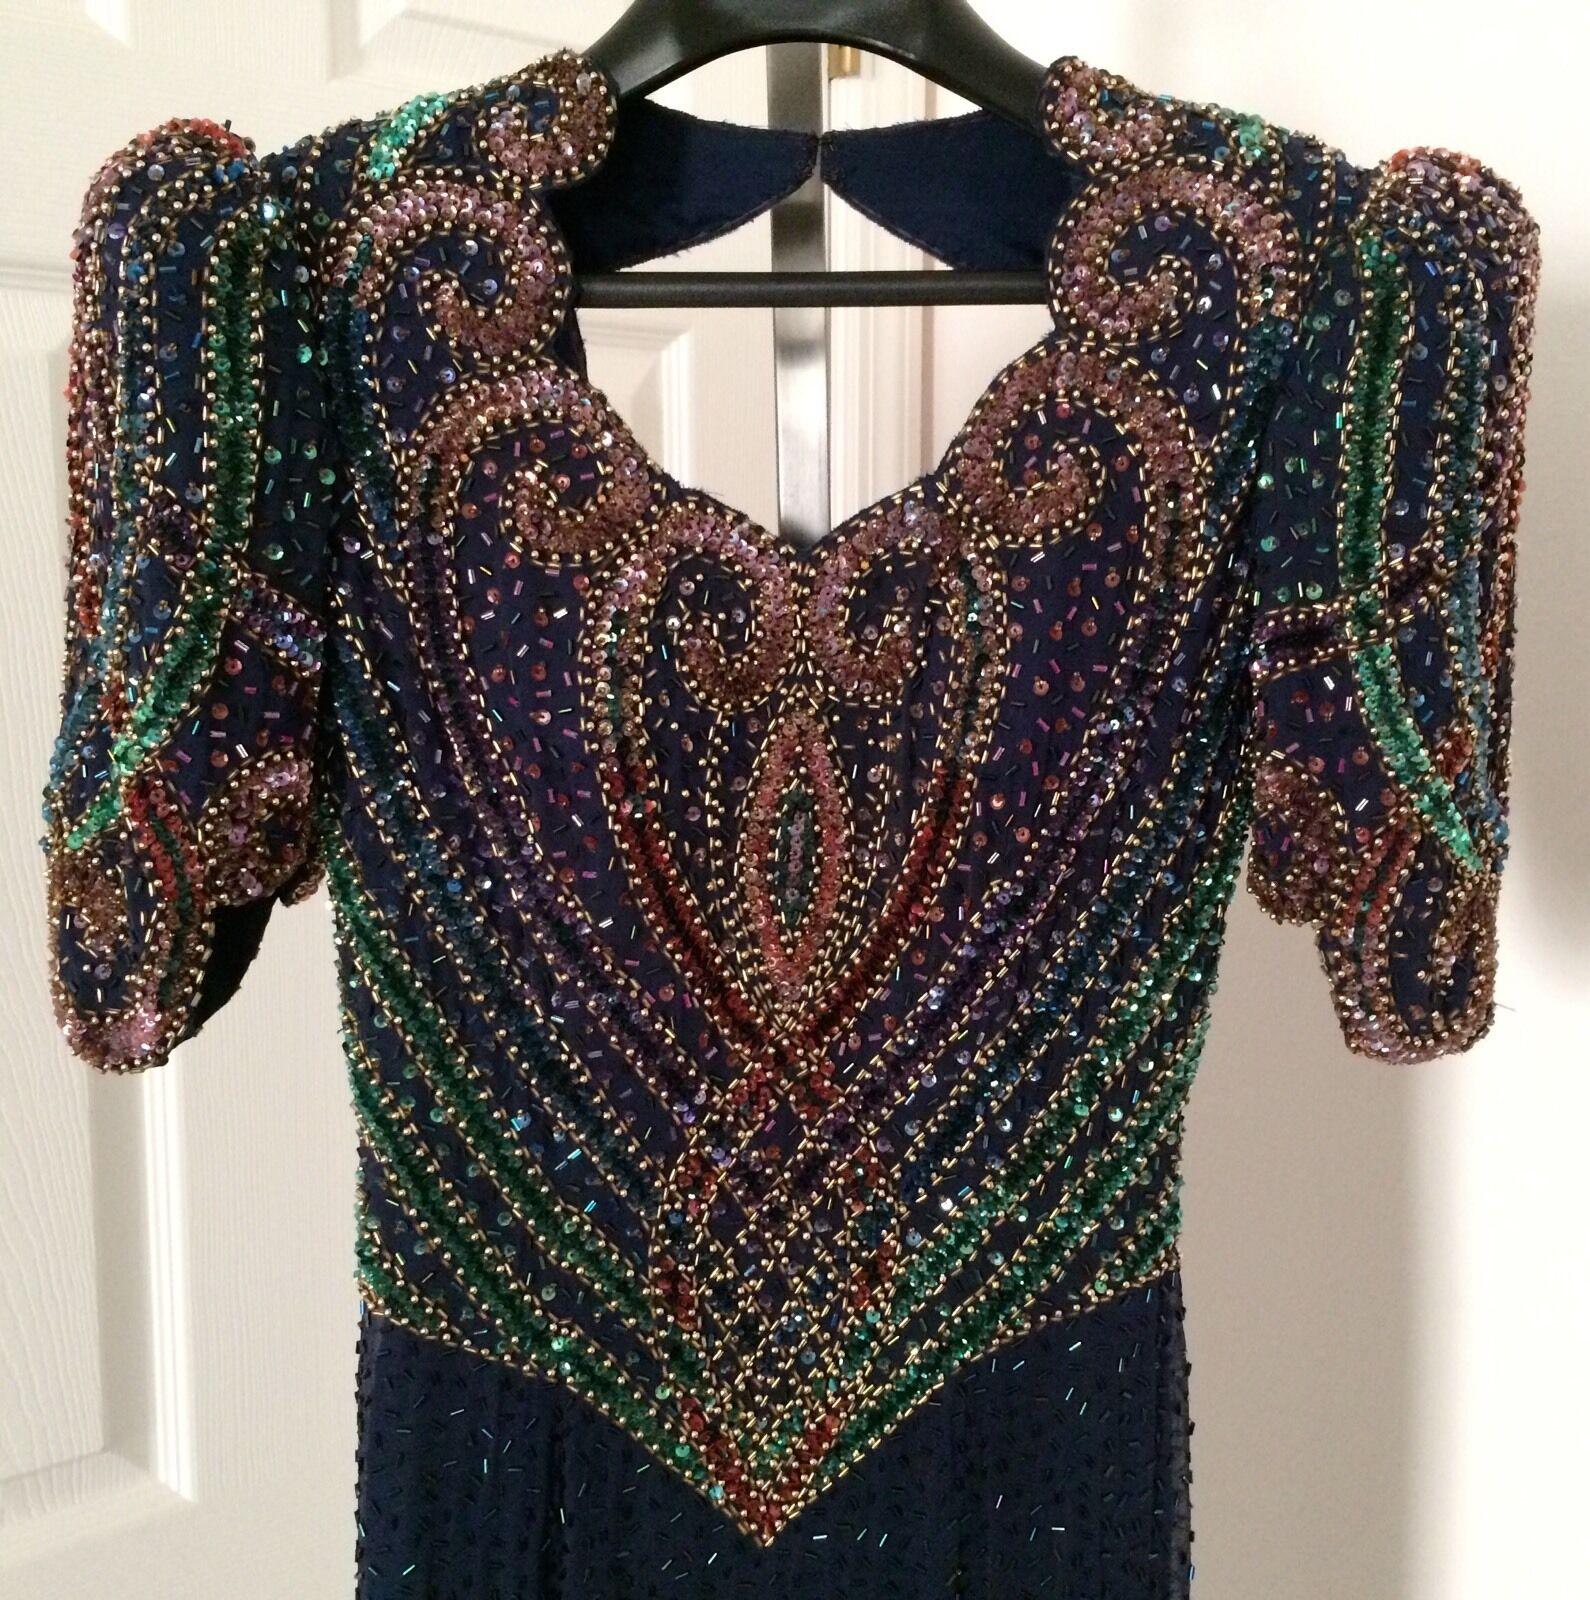 Landa 100% Silk Sequin Beaded Prom Formal Pageant Dress Gown Blau Grün Sz 6